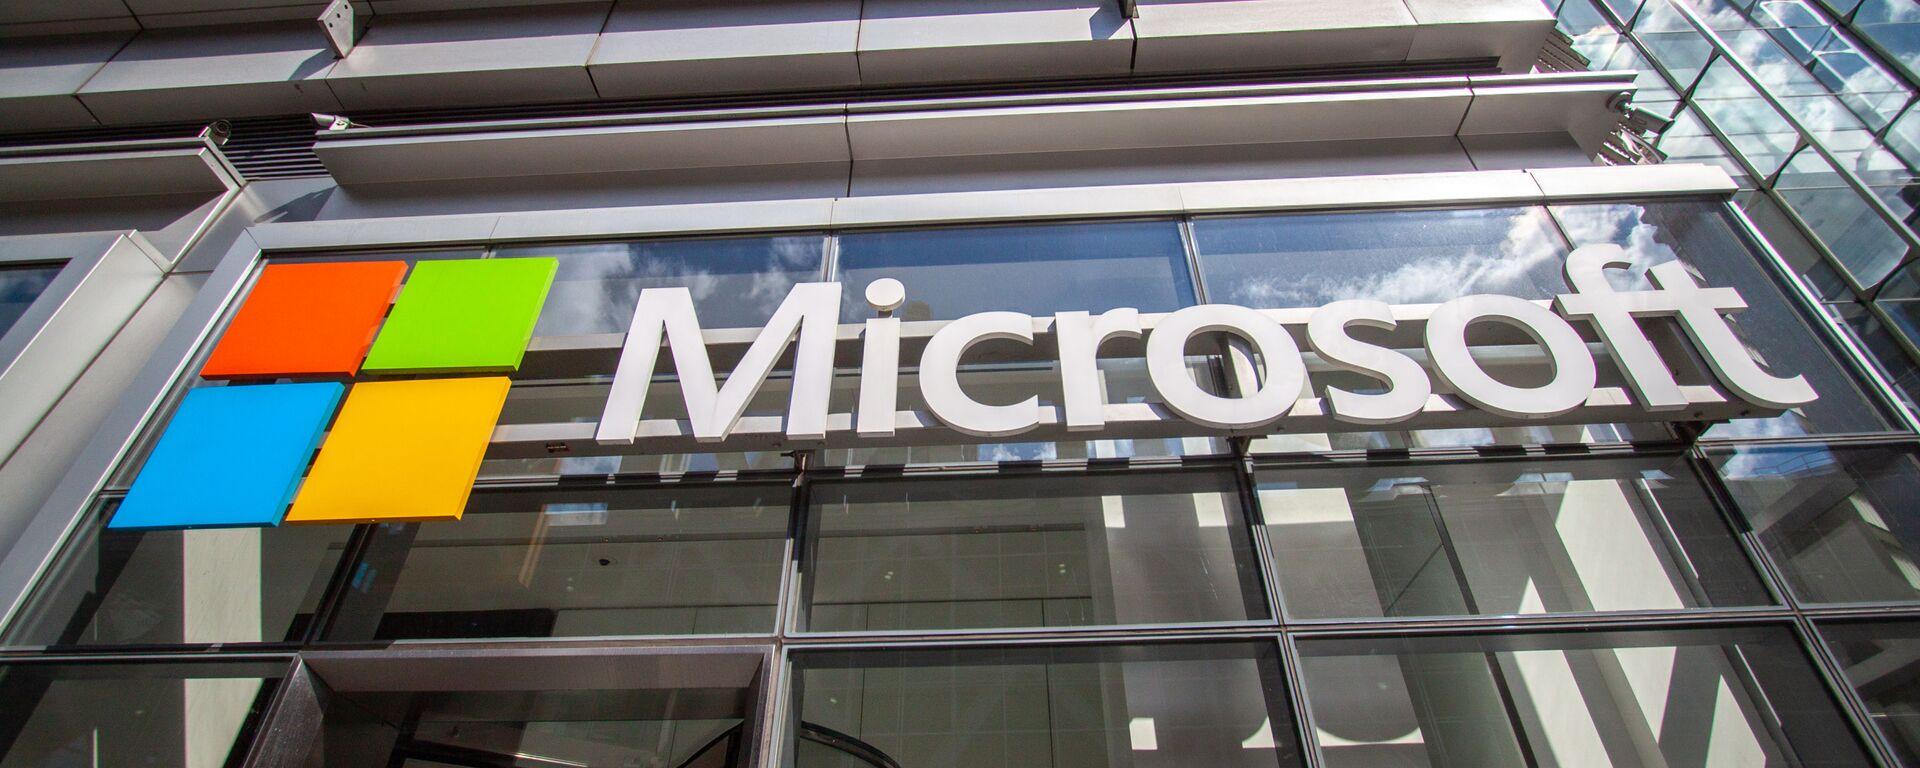 Biuro Microsoft na Manhattanie - Sputnik Polska, 1920, 06.03.2021